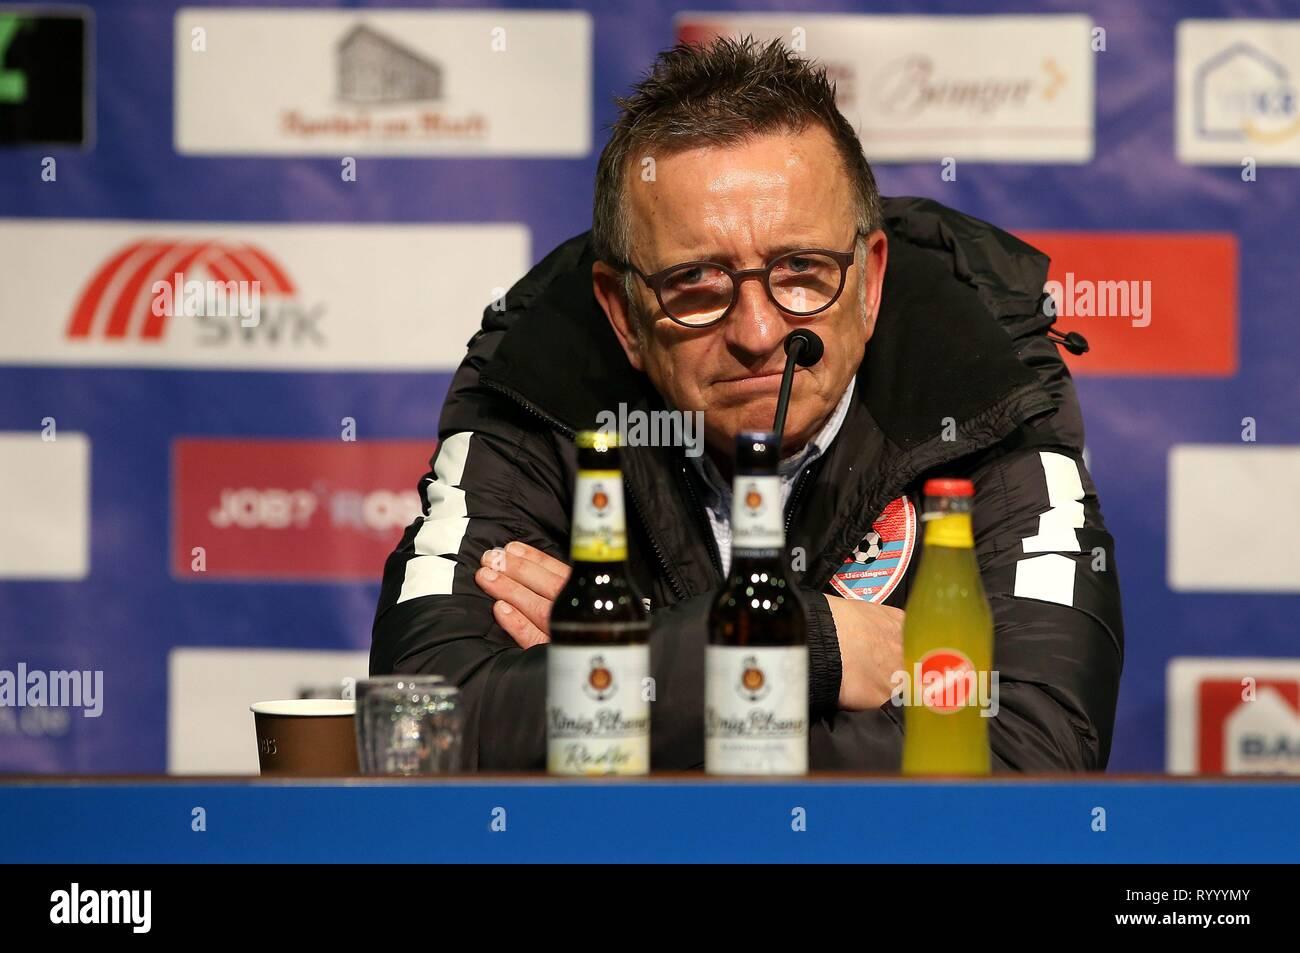 Duisburg, Deutschland. 15th Mar, 2019. firo: 15.03.2019 Football, 3. Bundesliga, Season 2018/2019 KFC Uerdingen 05 - SC Fortuna Köln coach Norbert Meier (#NM, KFC Uerdingen 05) not quite satisfied. | usage worldwide Credit: dpa/Alamy Live News - Stock Image